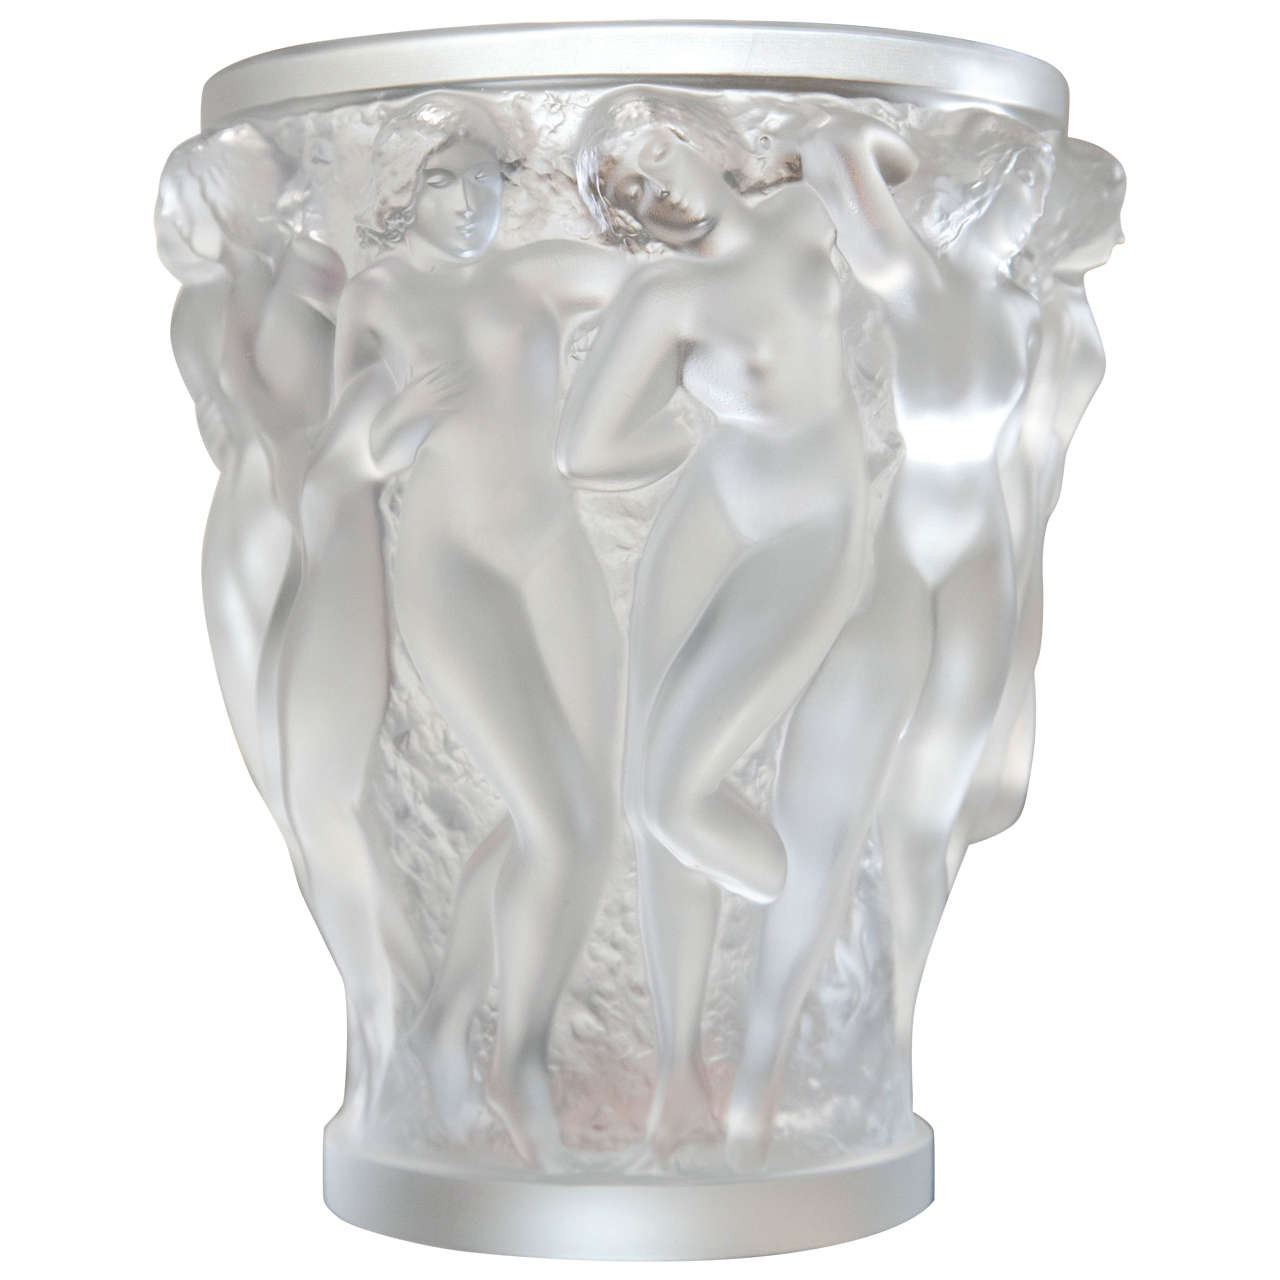 lalique crystal dampierre vase of lalique crystal vase at 1stdibs regarding lalique crystal vase for sale